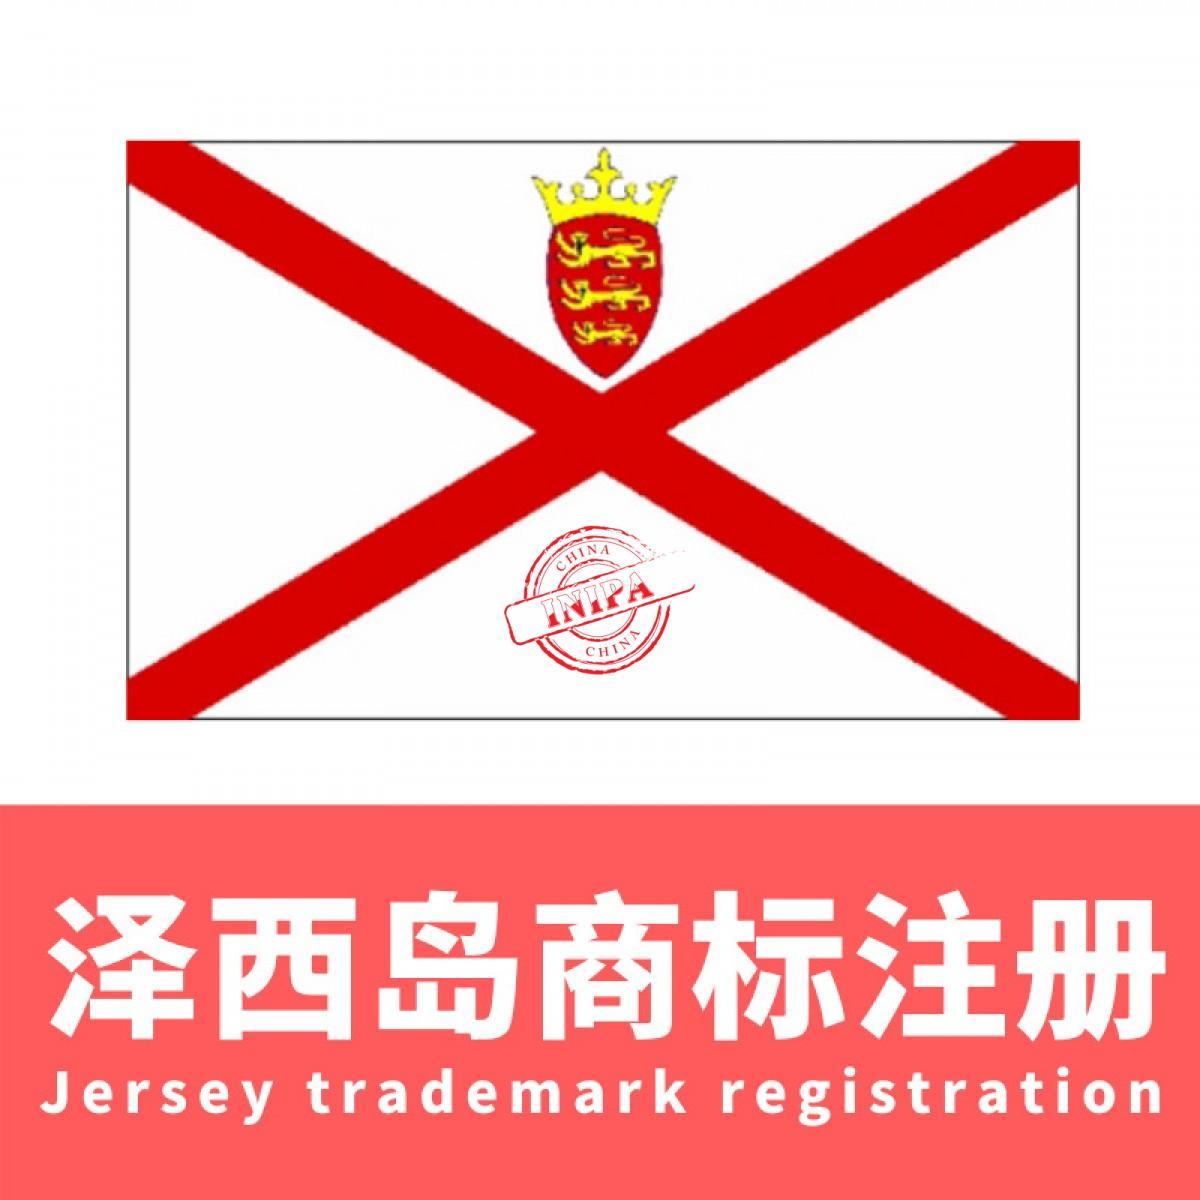 泽西岛商标注册/Jersey trademark registration